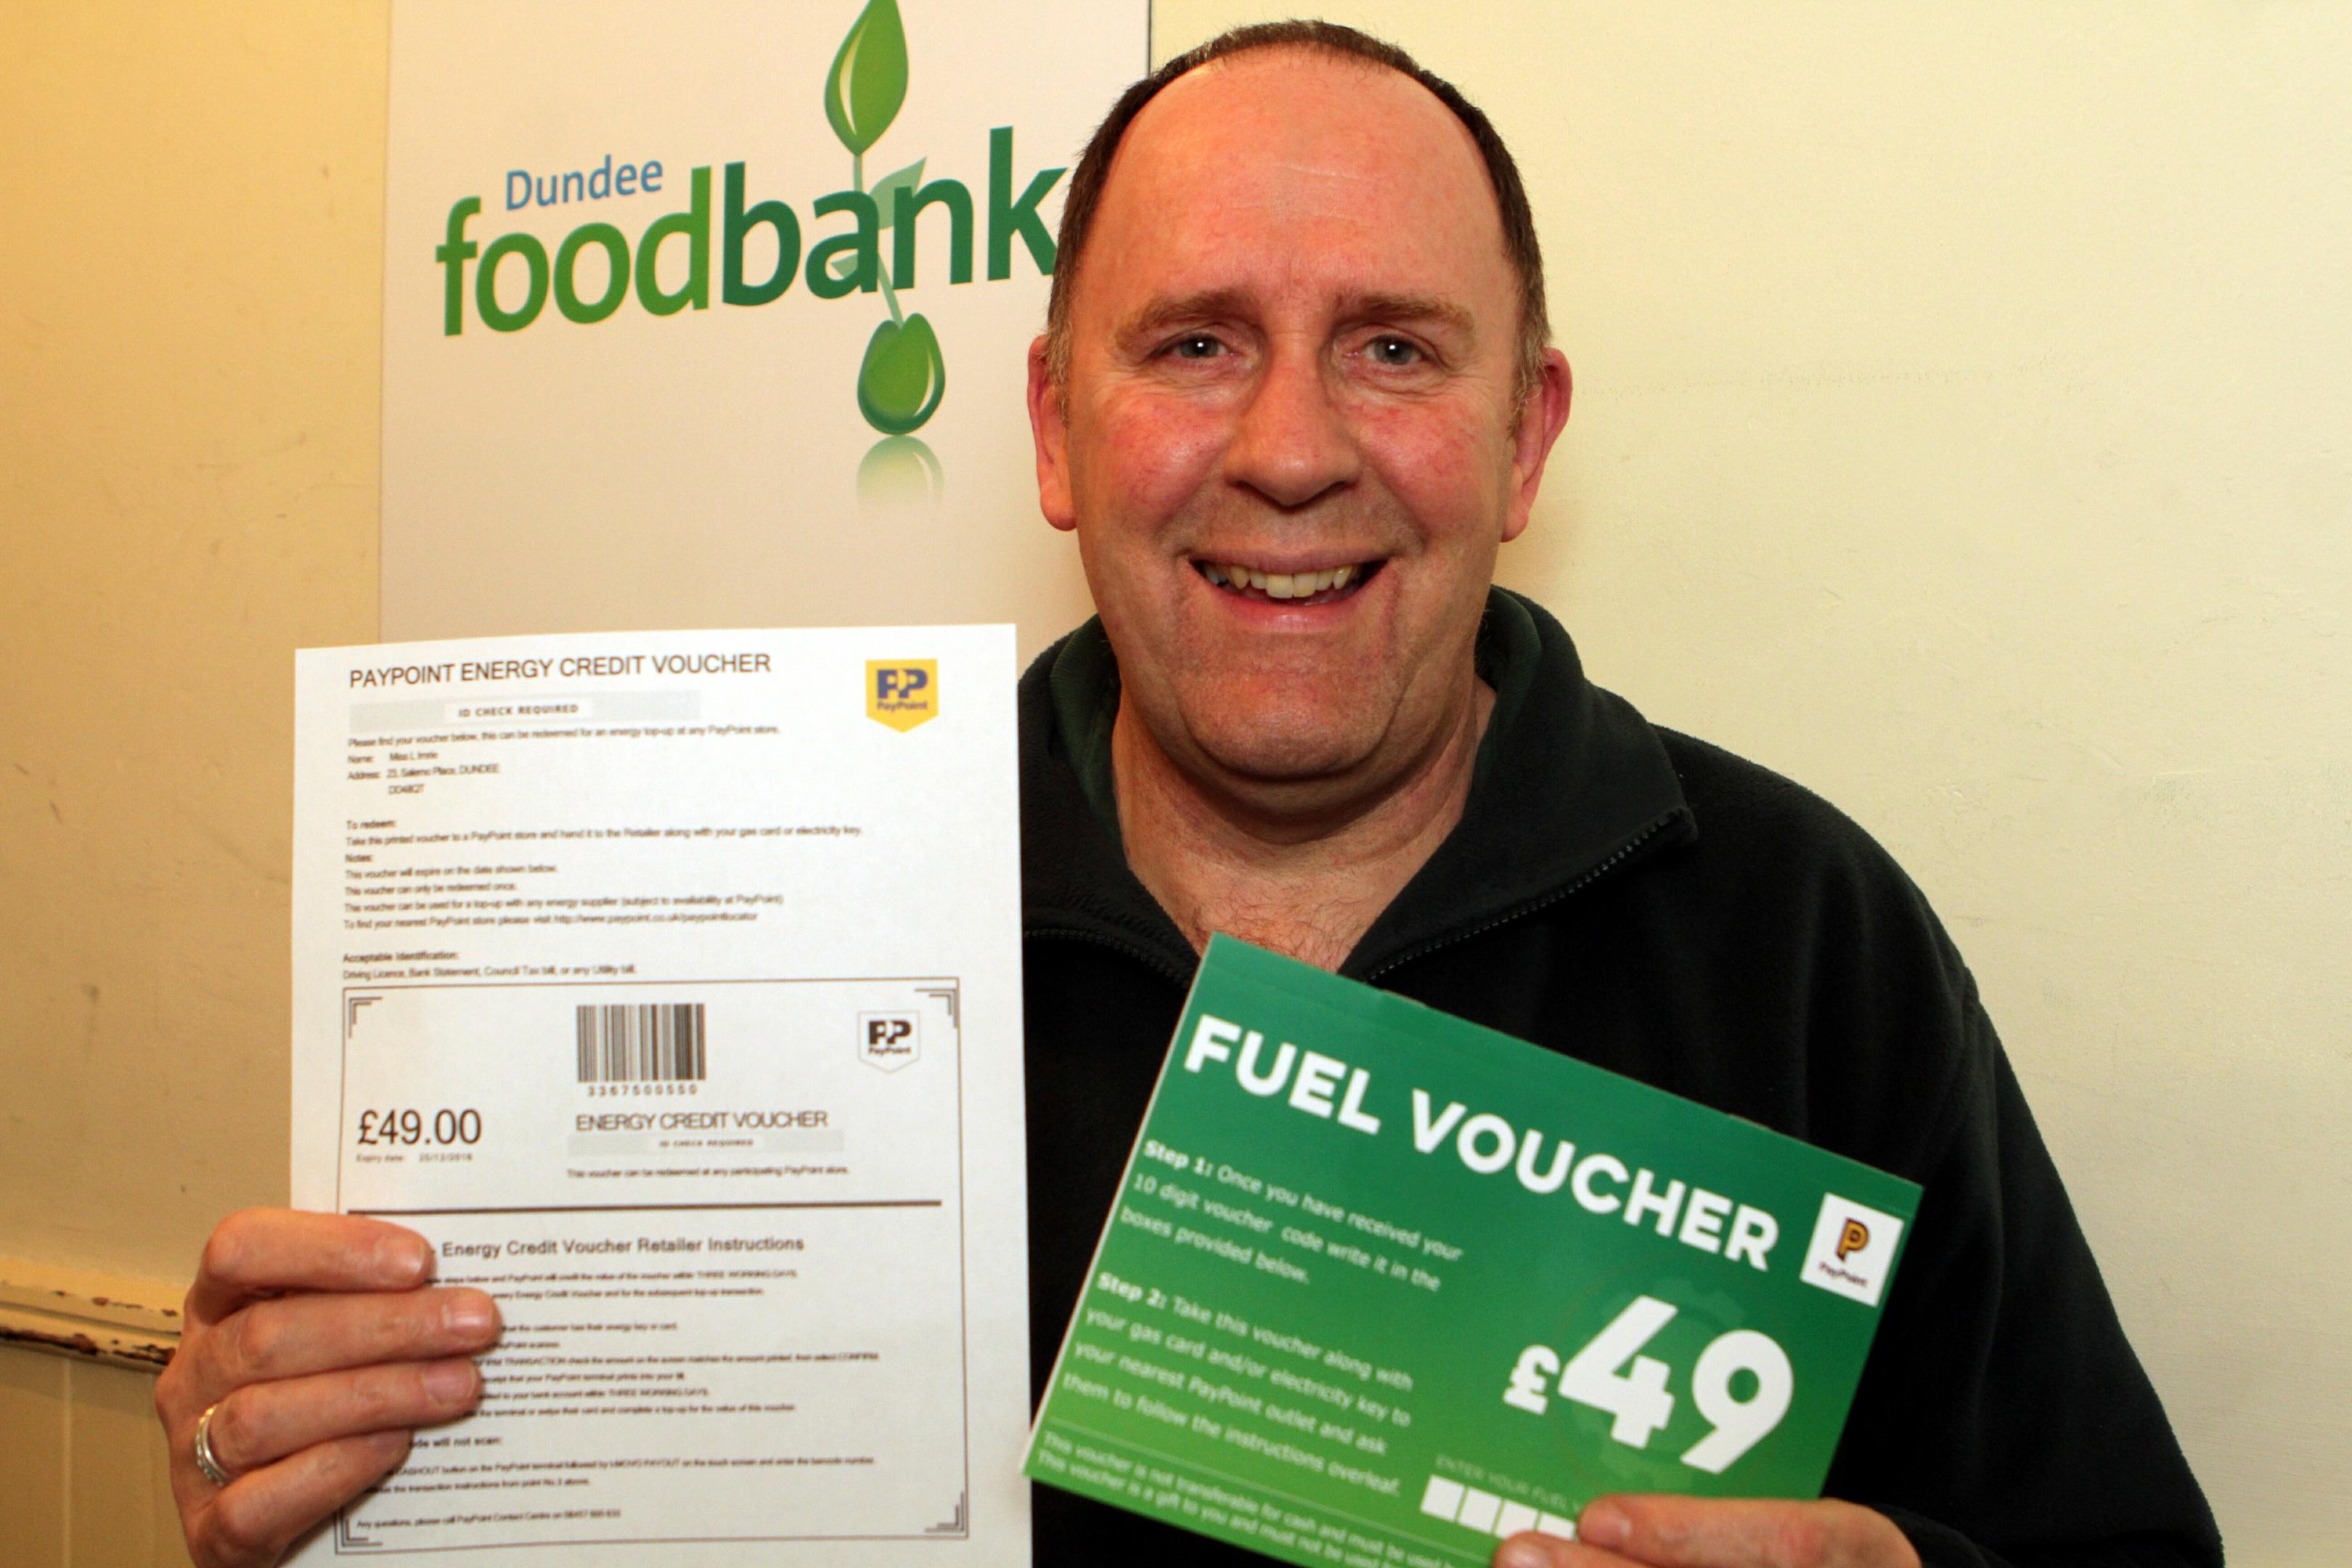 Ken Linton manager of Dundee Foodbank